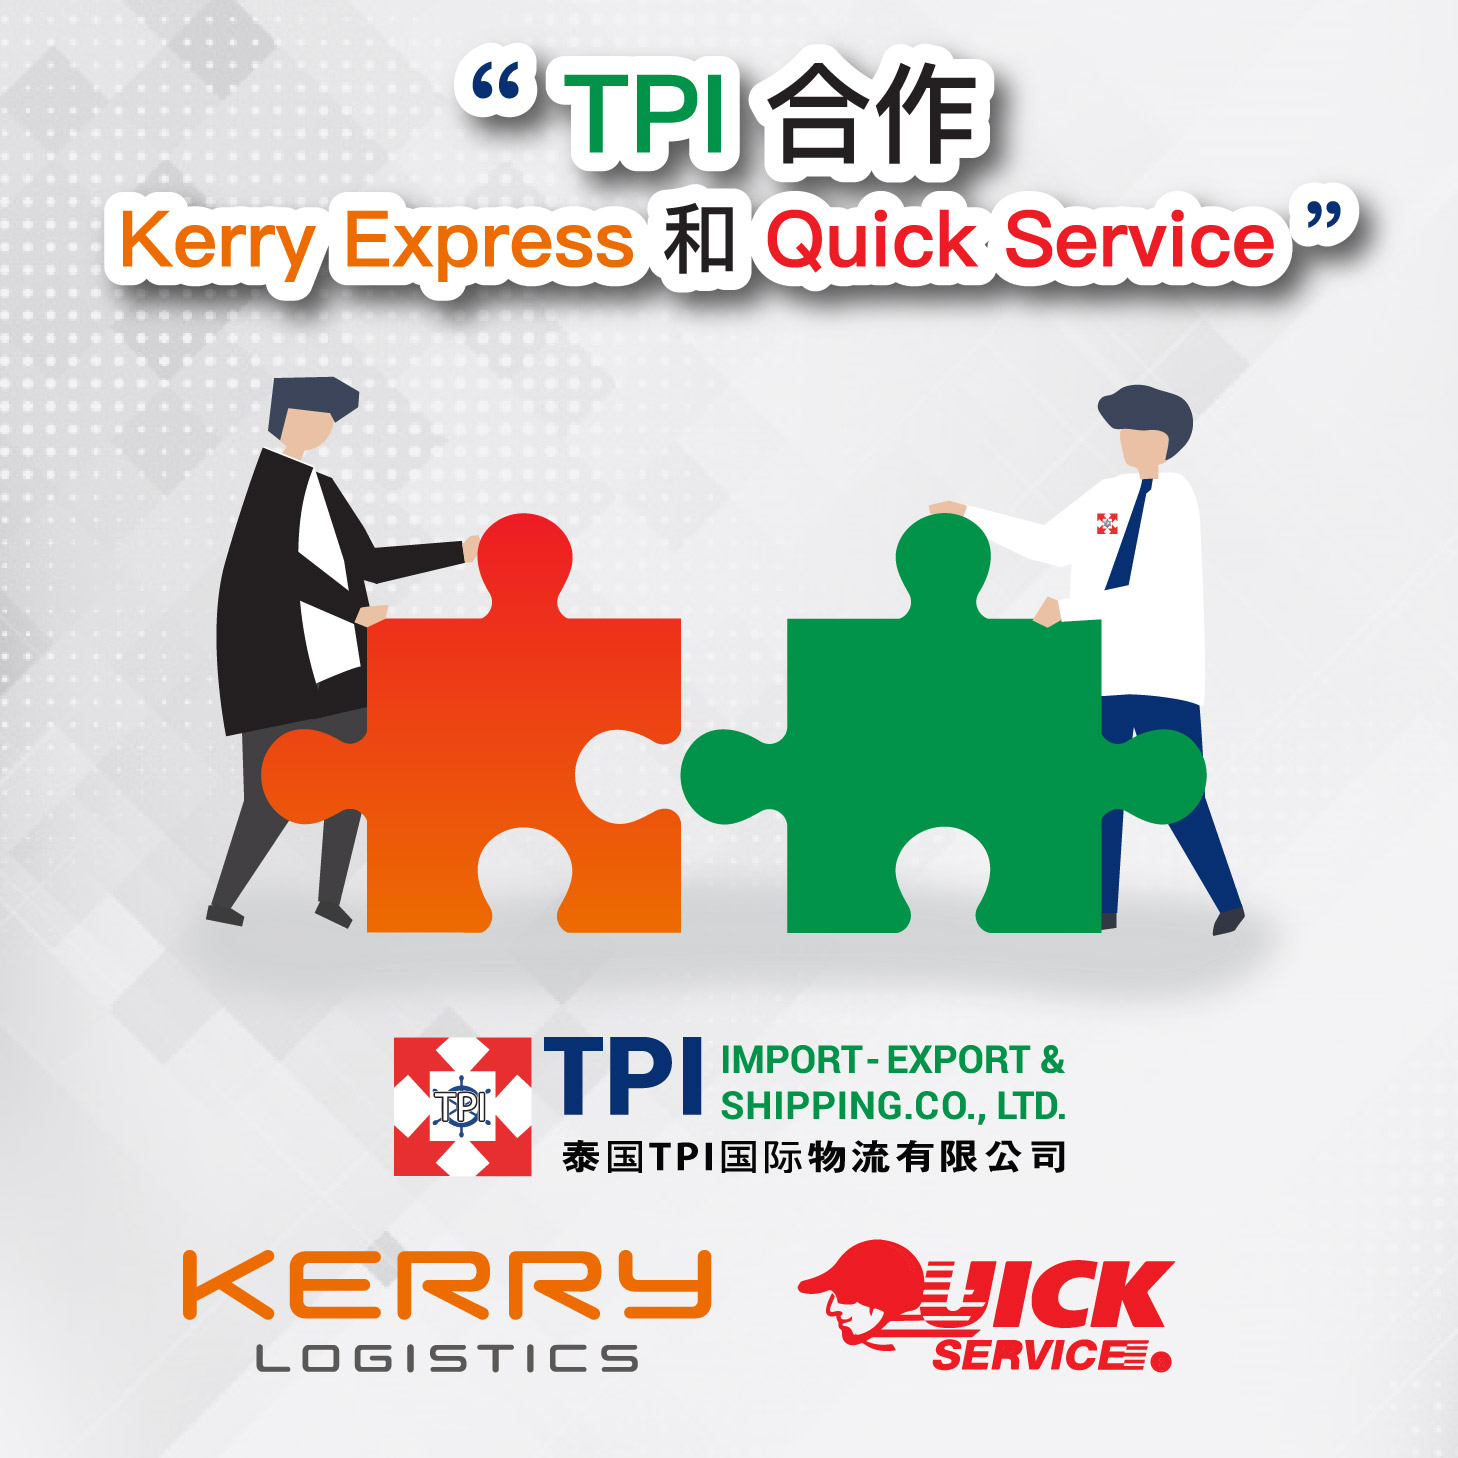 TPI 合作  Kerry Express 和 Quick Service